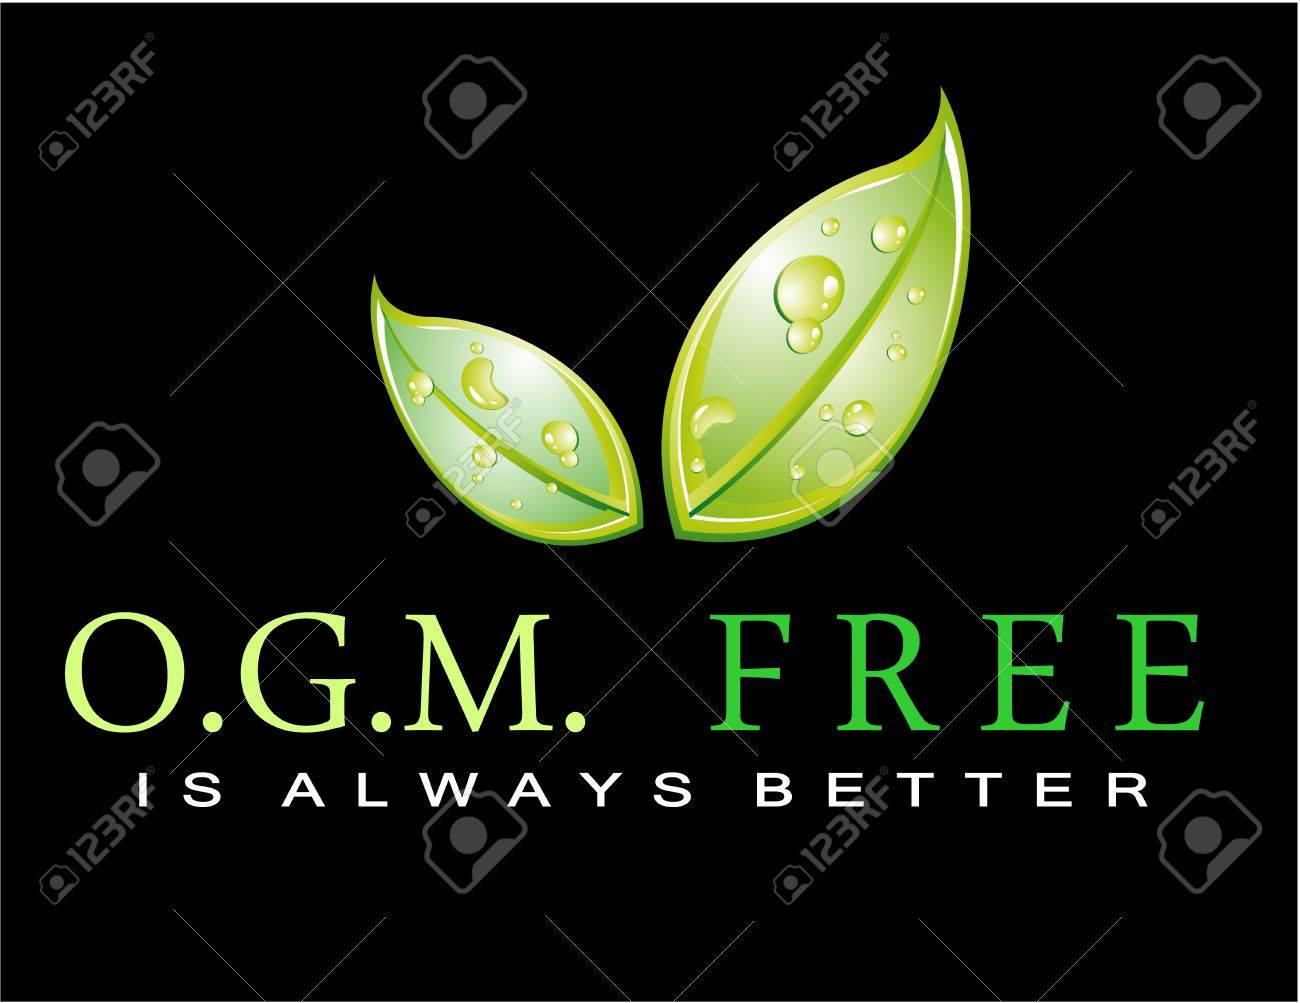 Green Slogan: OGM FREE is always better Stock Vector - 7719459